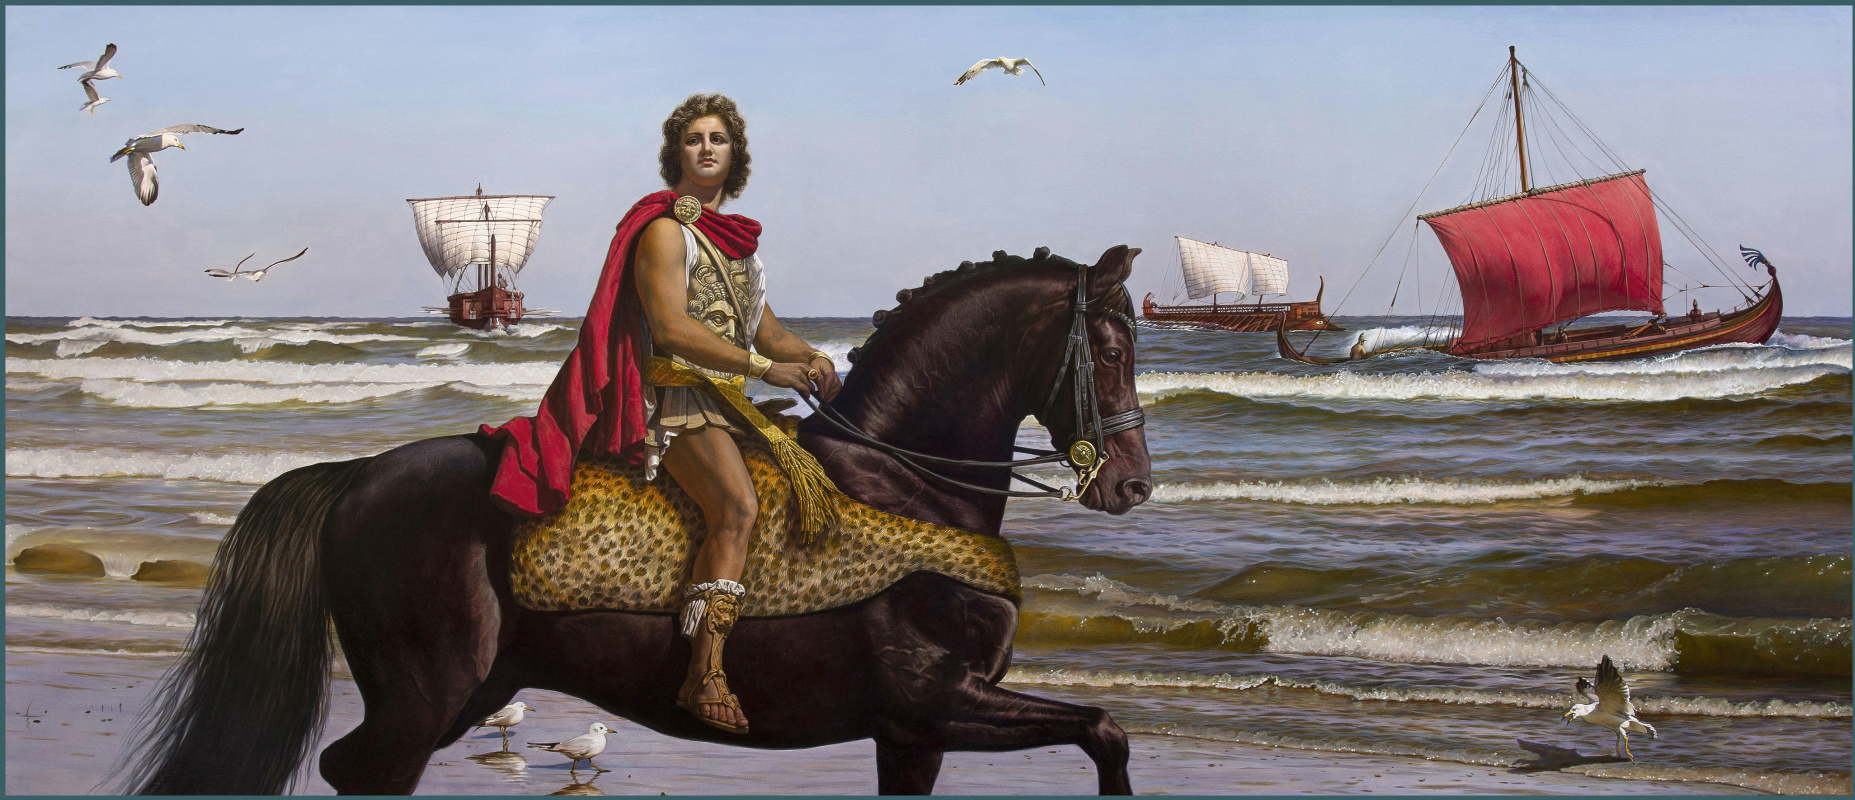 Sushienok64@mail.ru Михайлович Сушенок Игорь. Alexander III The Great King of Macedon.